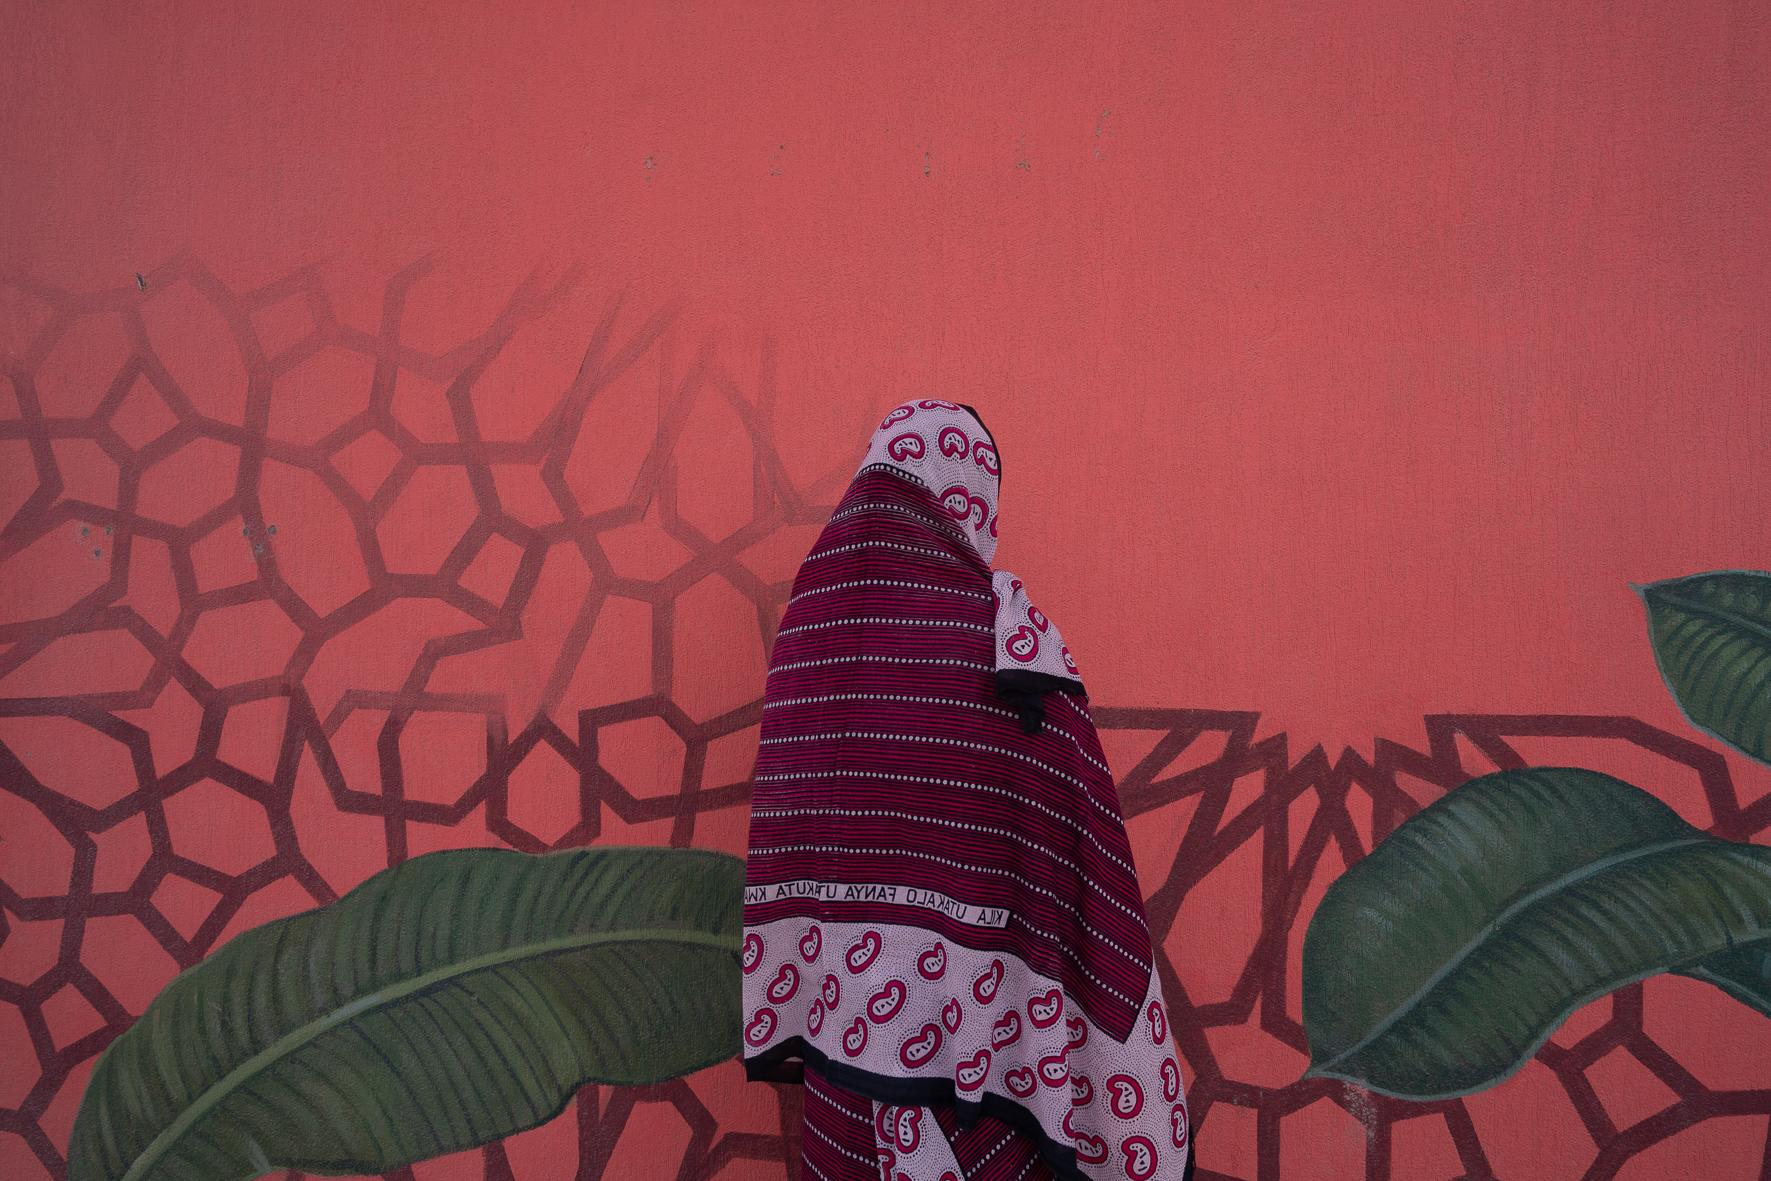 Shaima Al Tamimi - 901 - 26 Shaima Al Tamimi - As if we never came.jpg